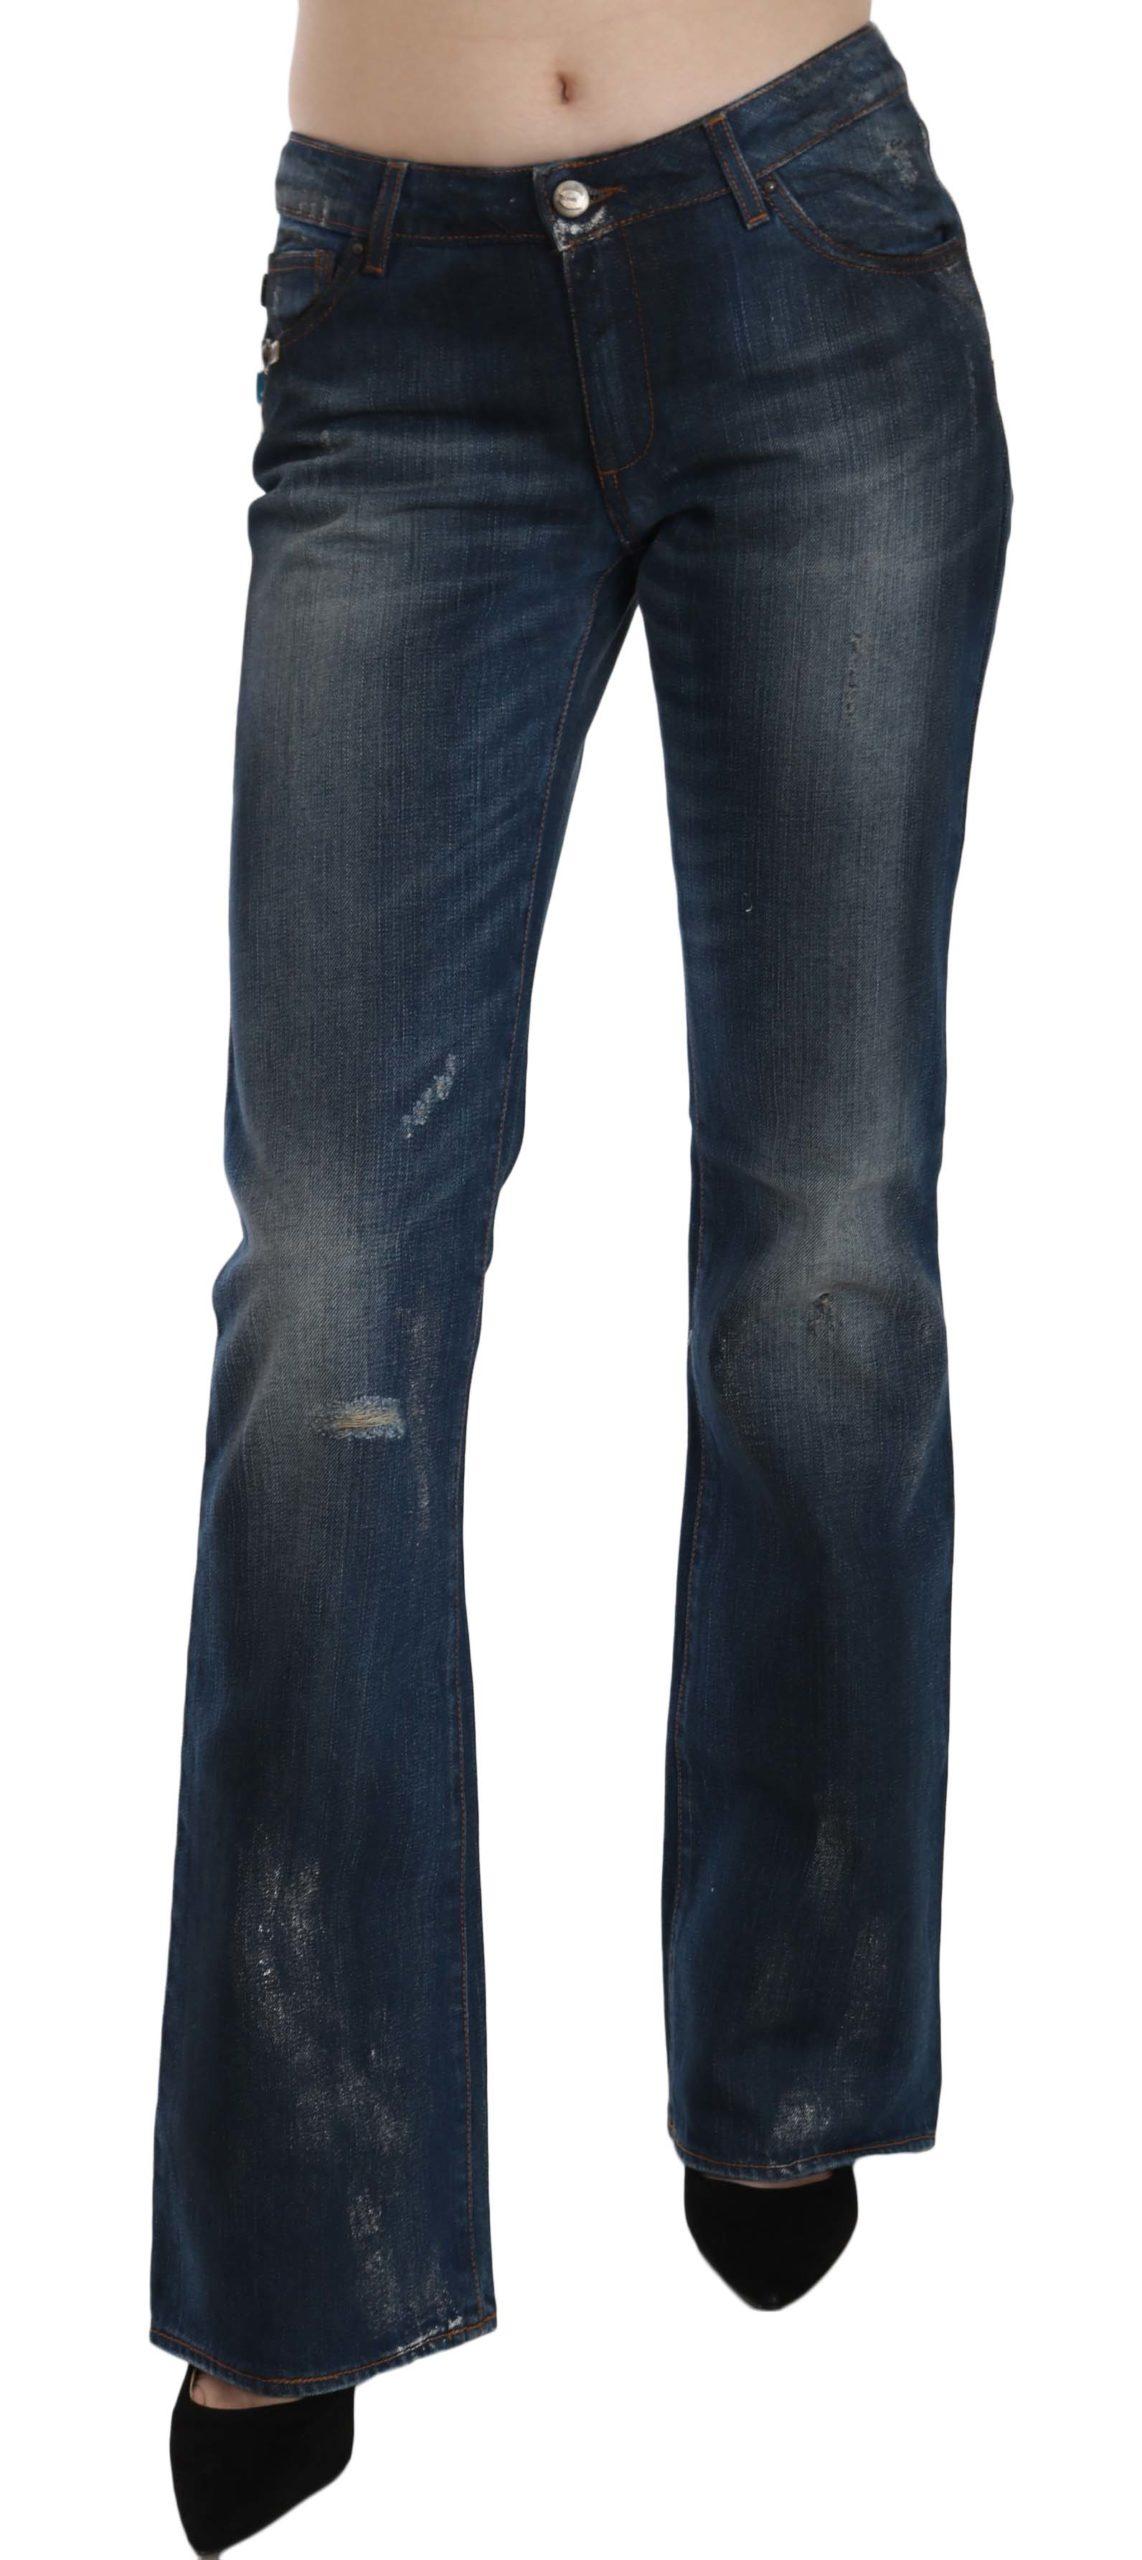 Just Cavalli Women's Mid Waist Boot Cut Denim Trouser Blue PAN70370 - W26